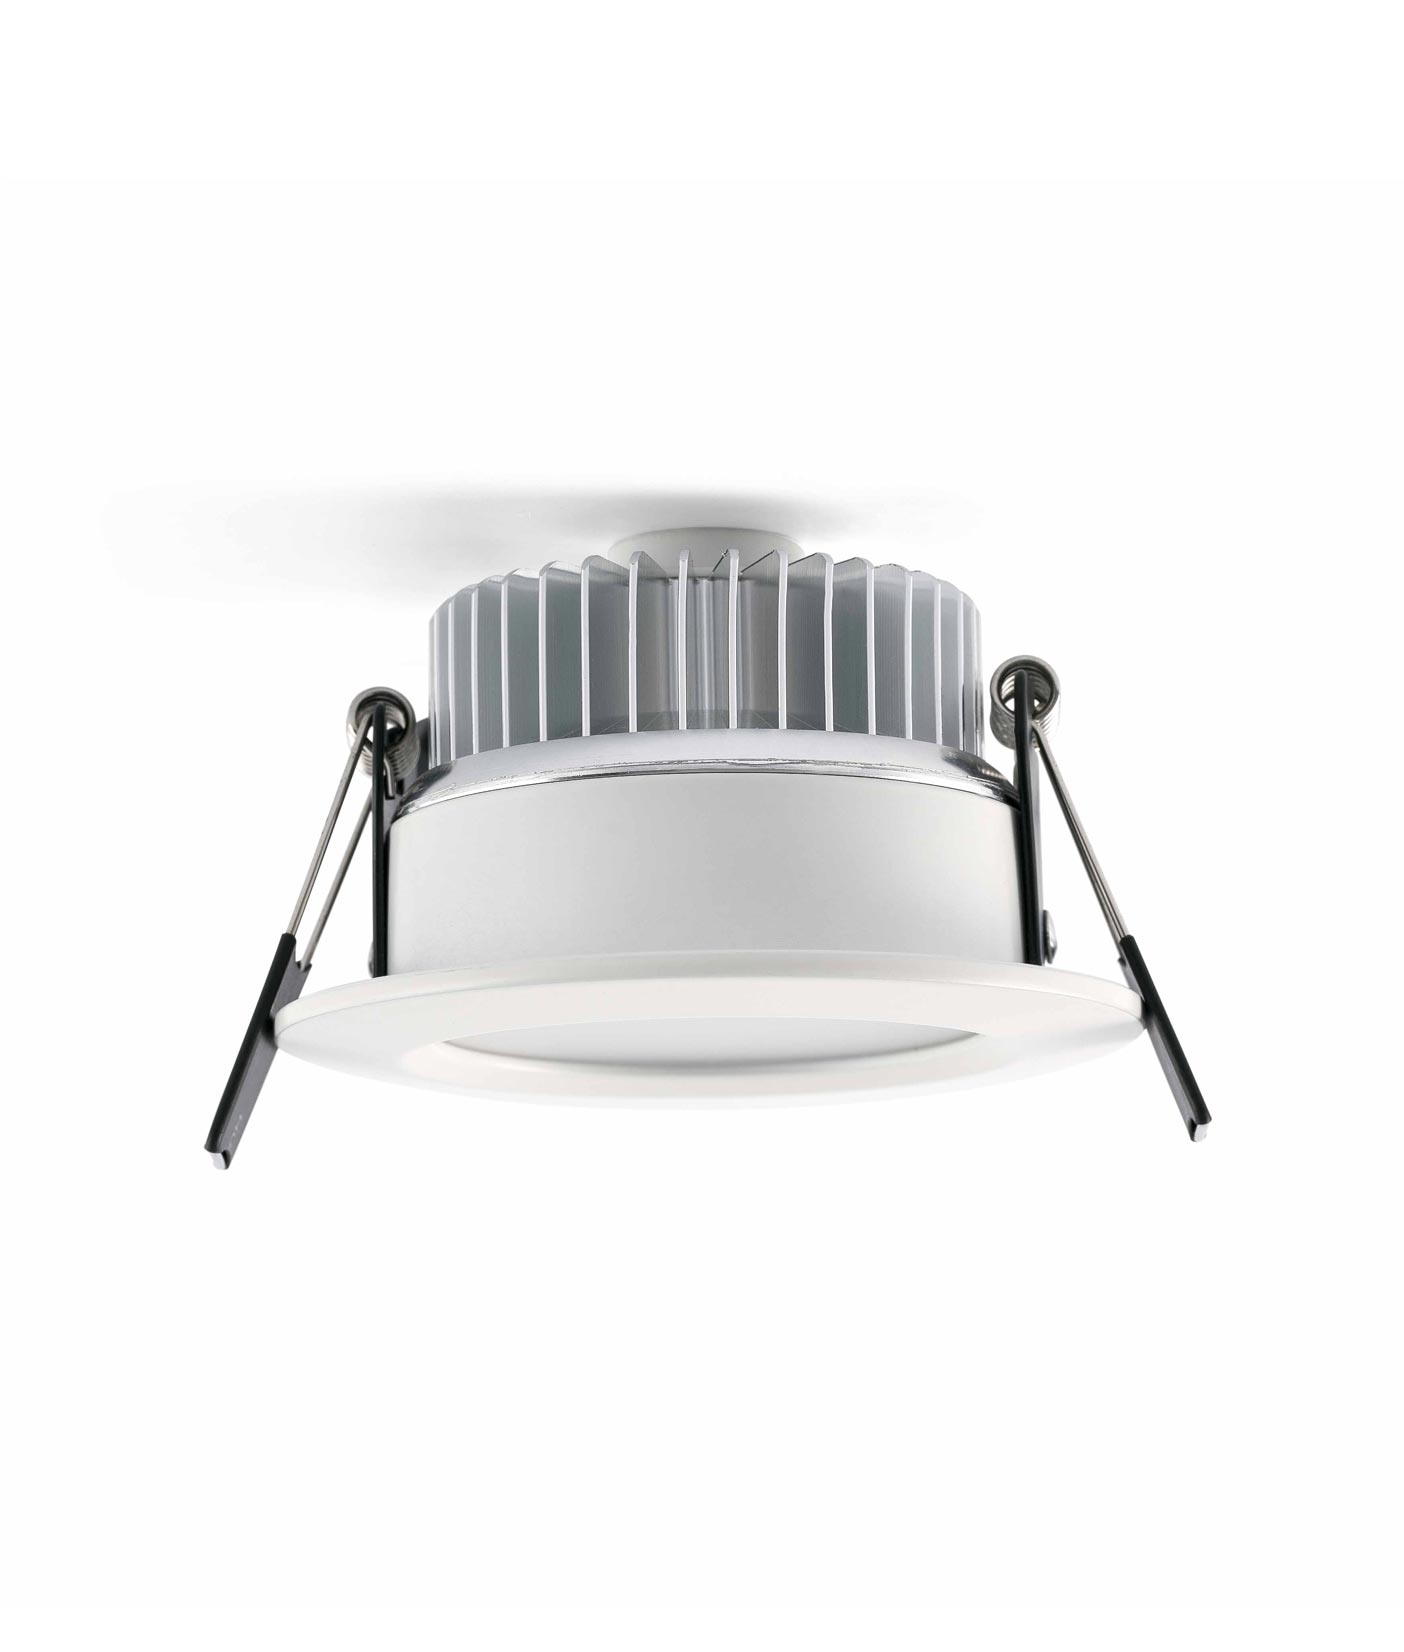 Empotrable LED DANA blanco detalle